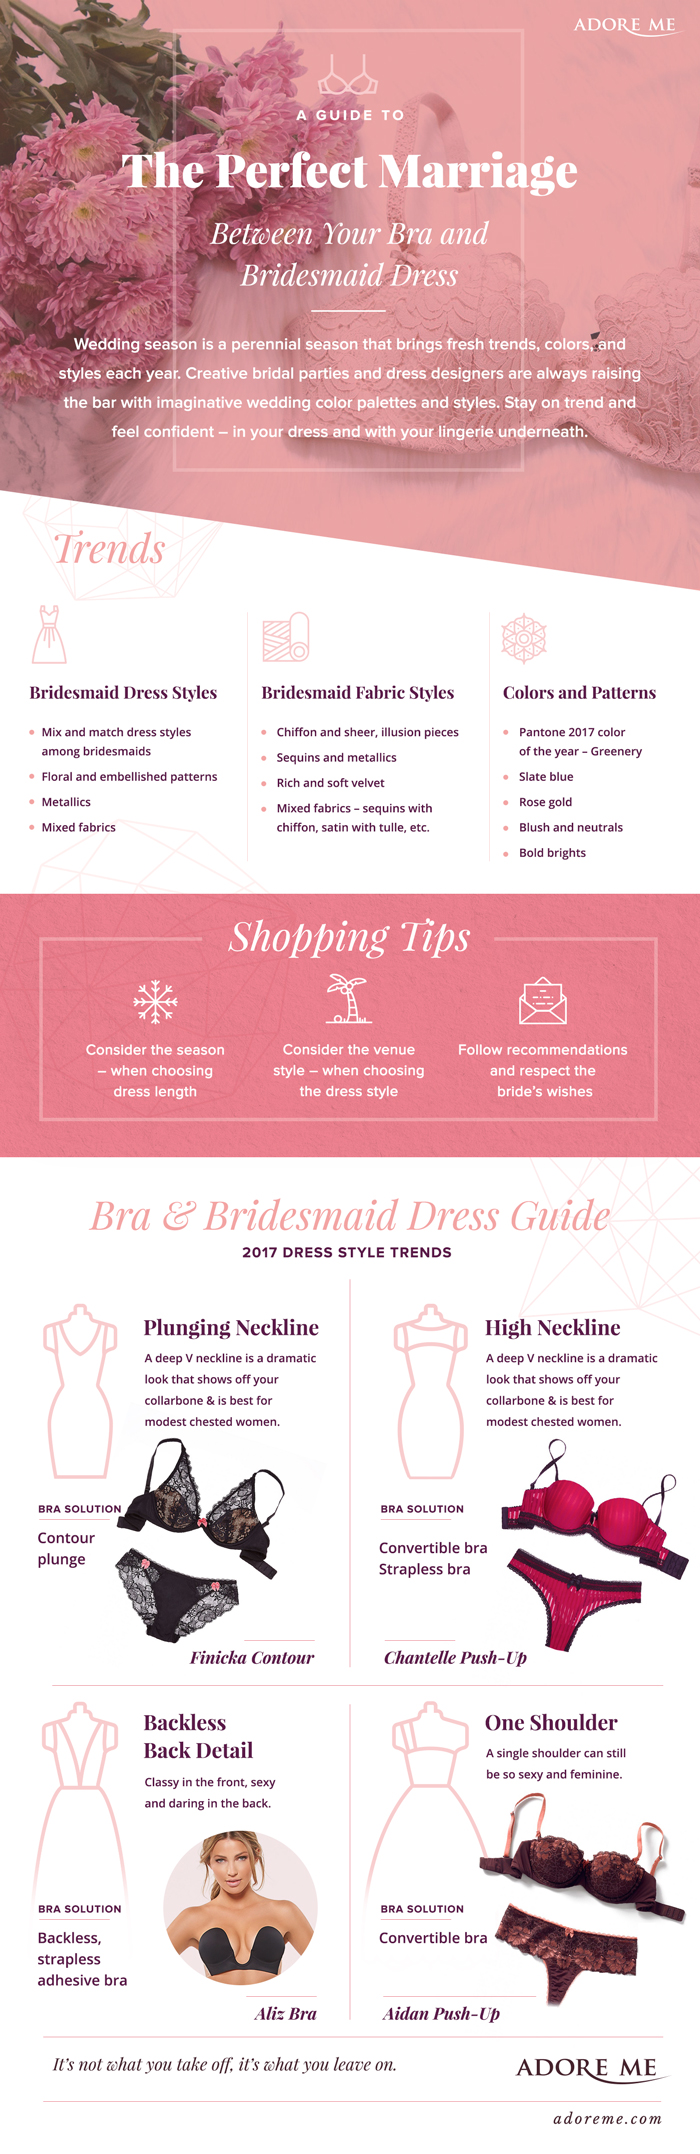 adoreme_bridesmaid_dress-333x1024.jpg